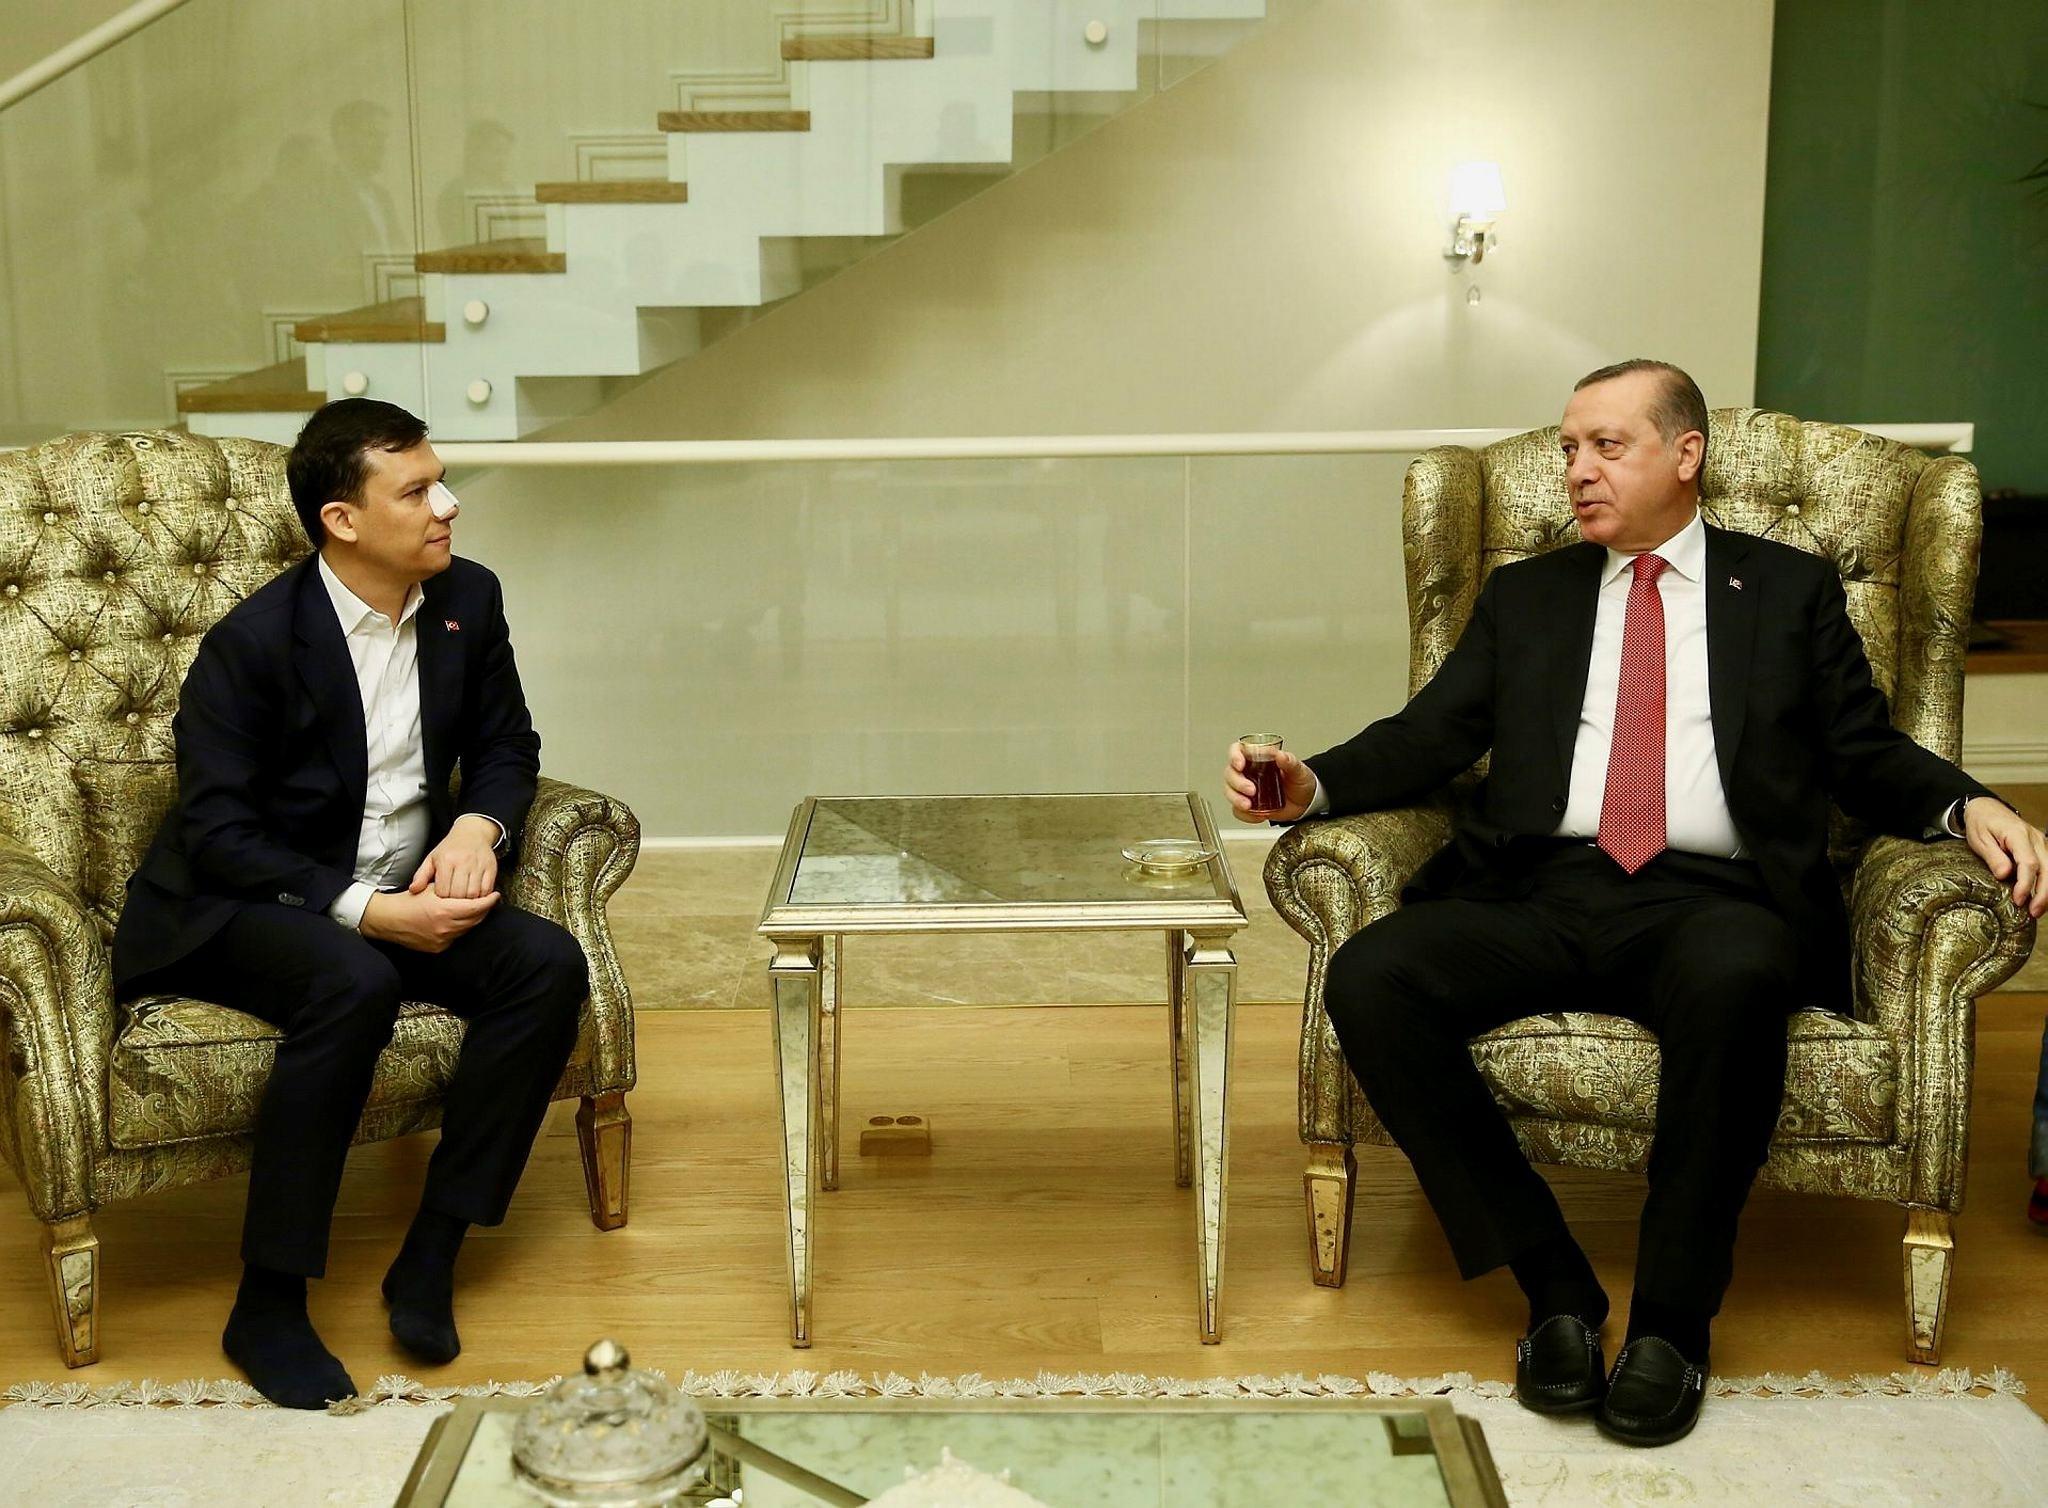 Fatih u015eahin (L) and President Erdou011fan